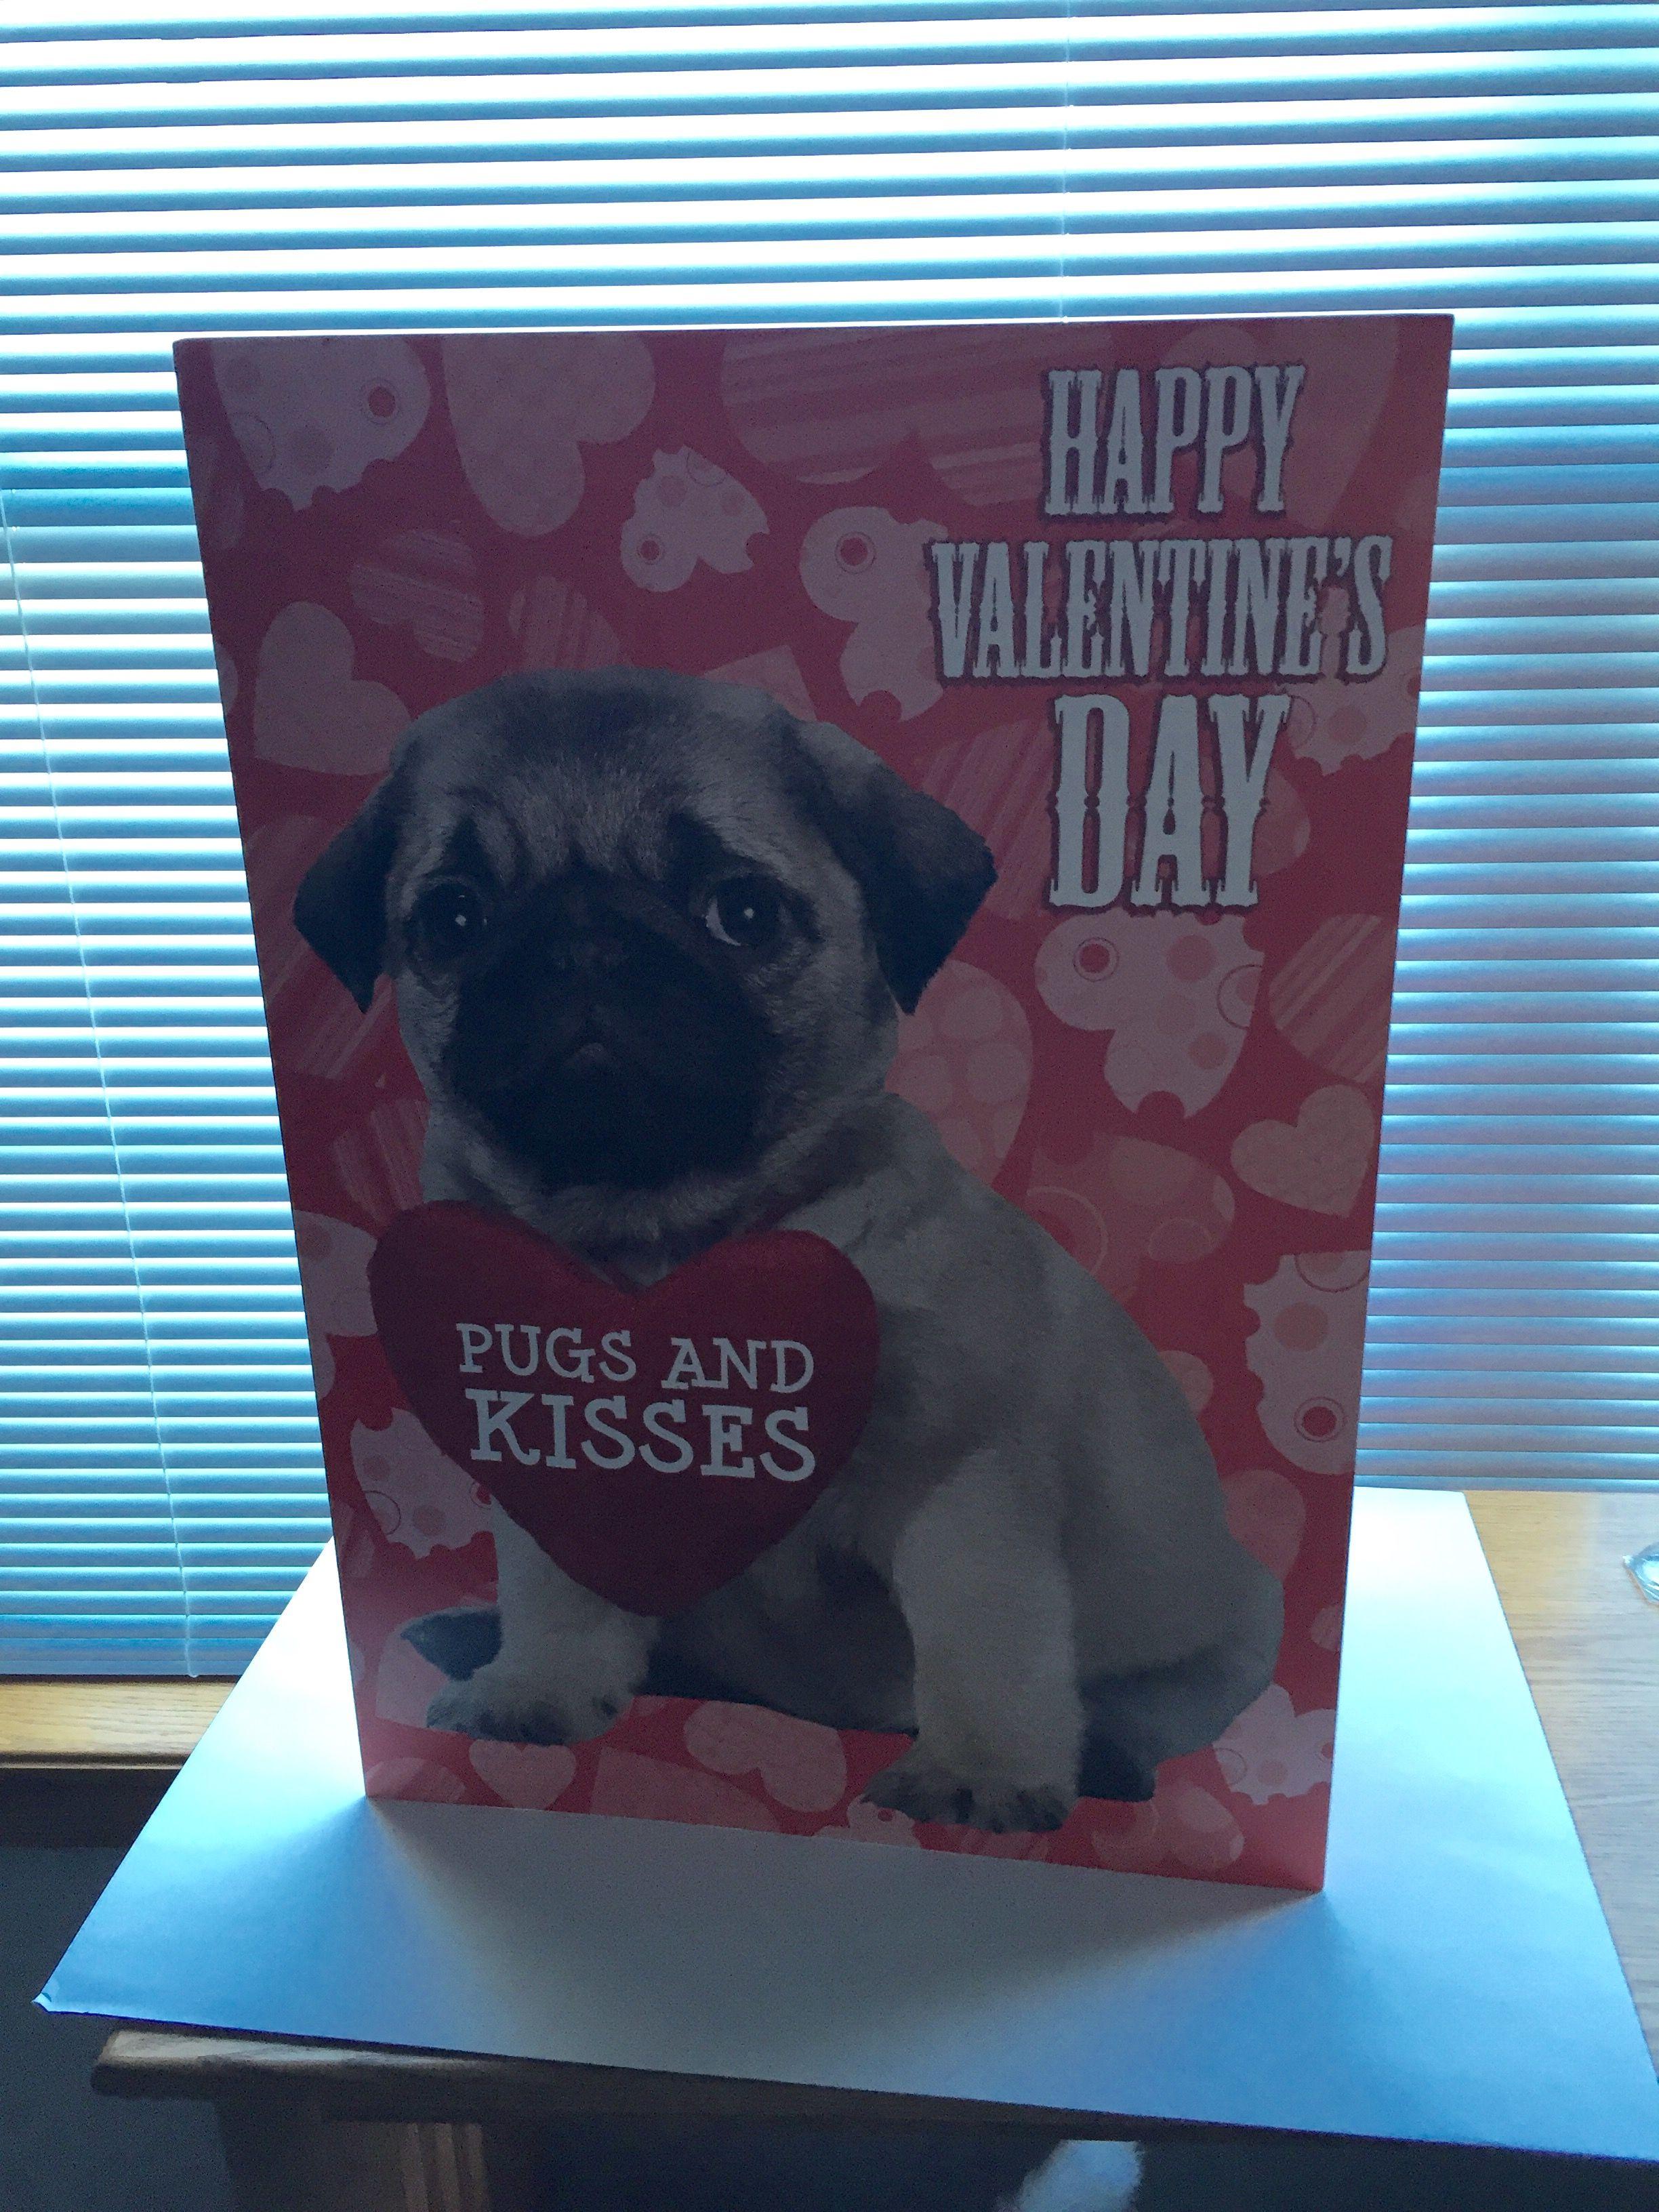 Pug Valentine Card Pug Valentine Pugs Kisses Happy Valentines Day